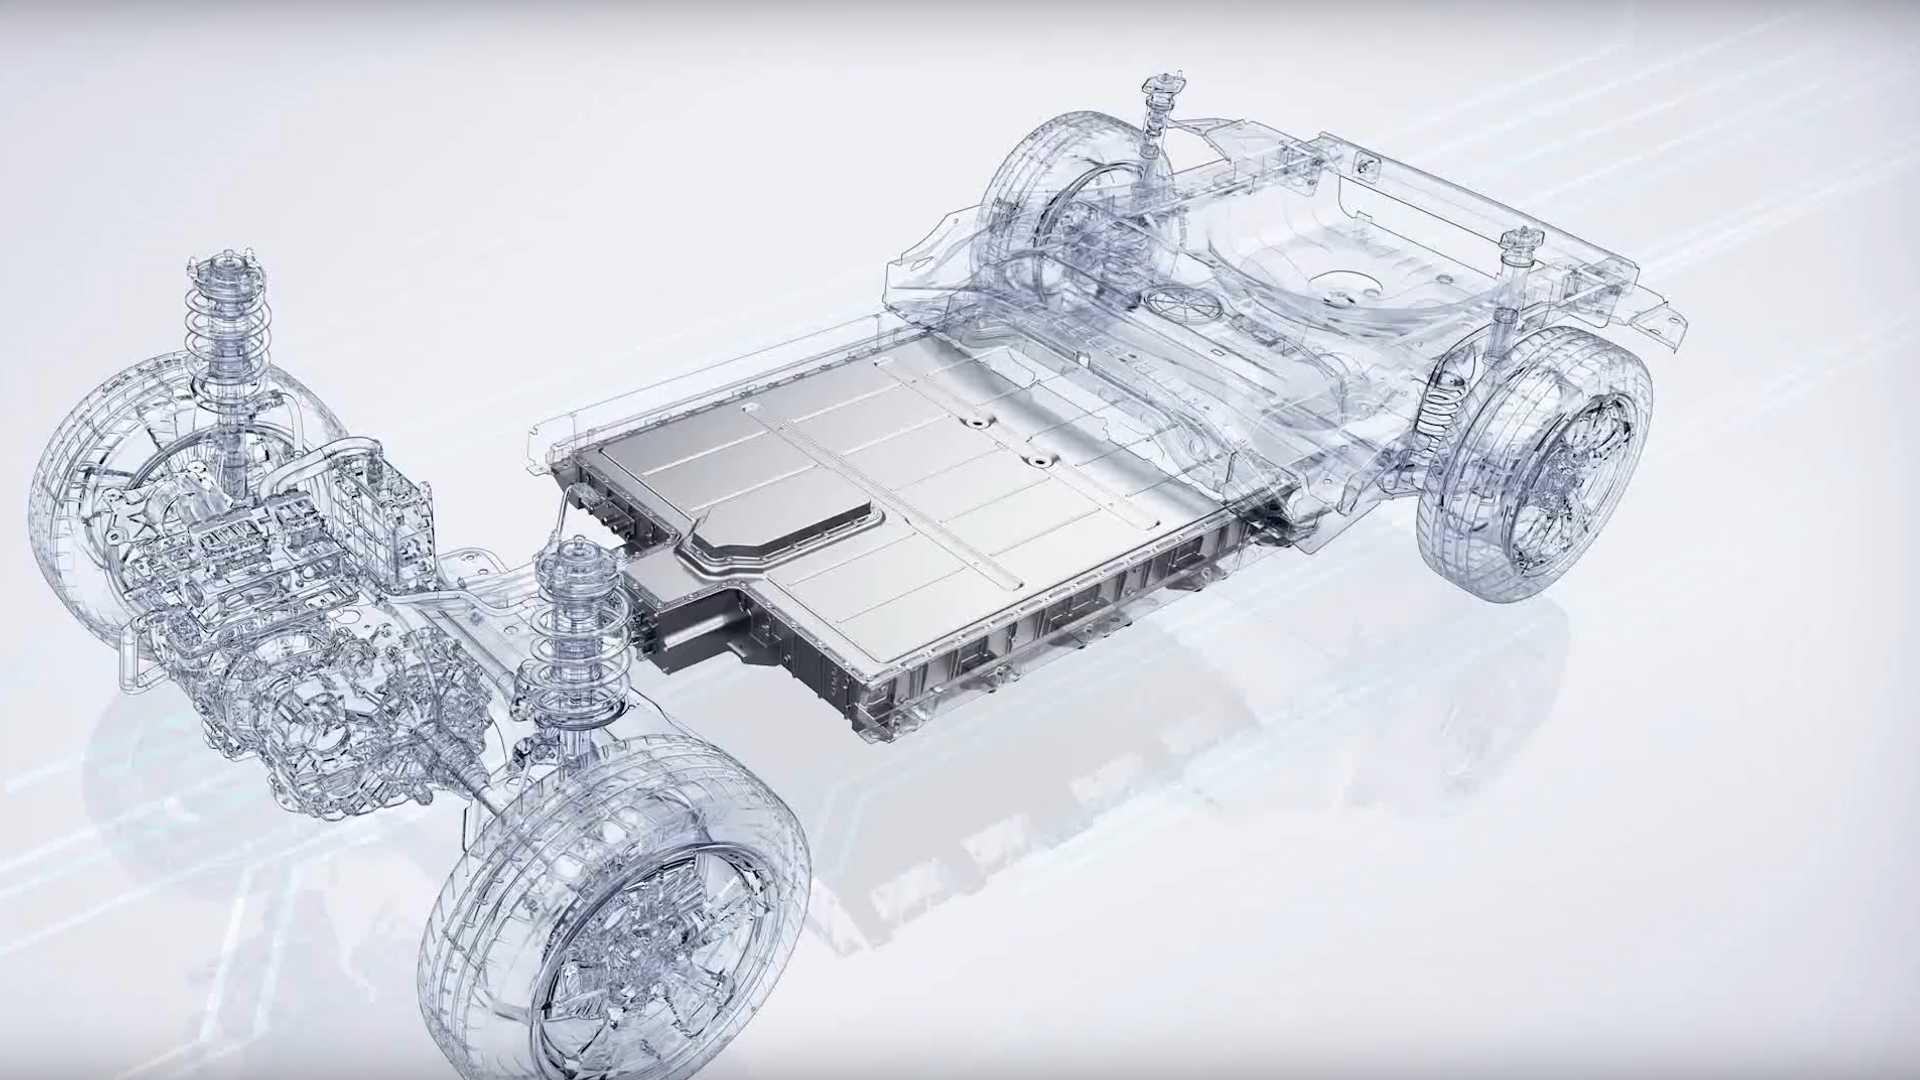 MG ZS EV Electric Car Battery